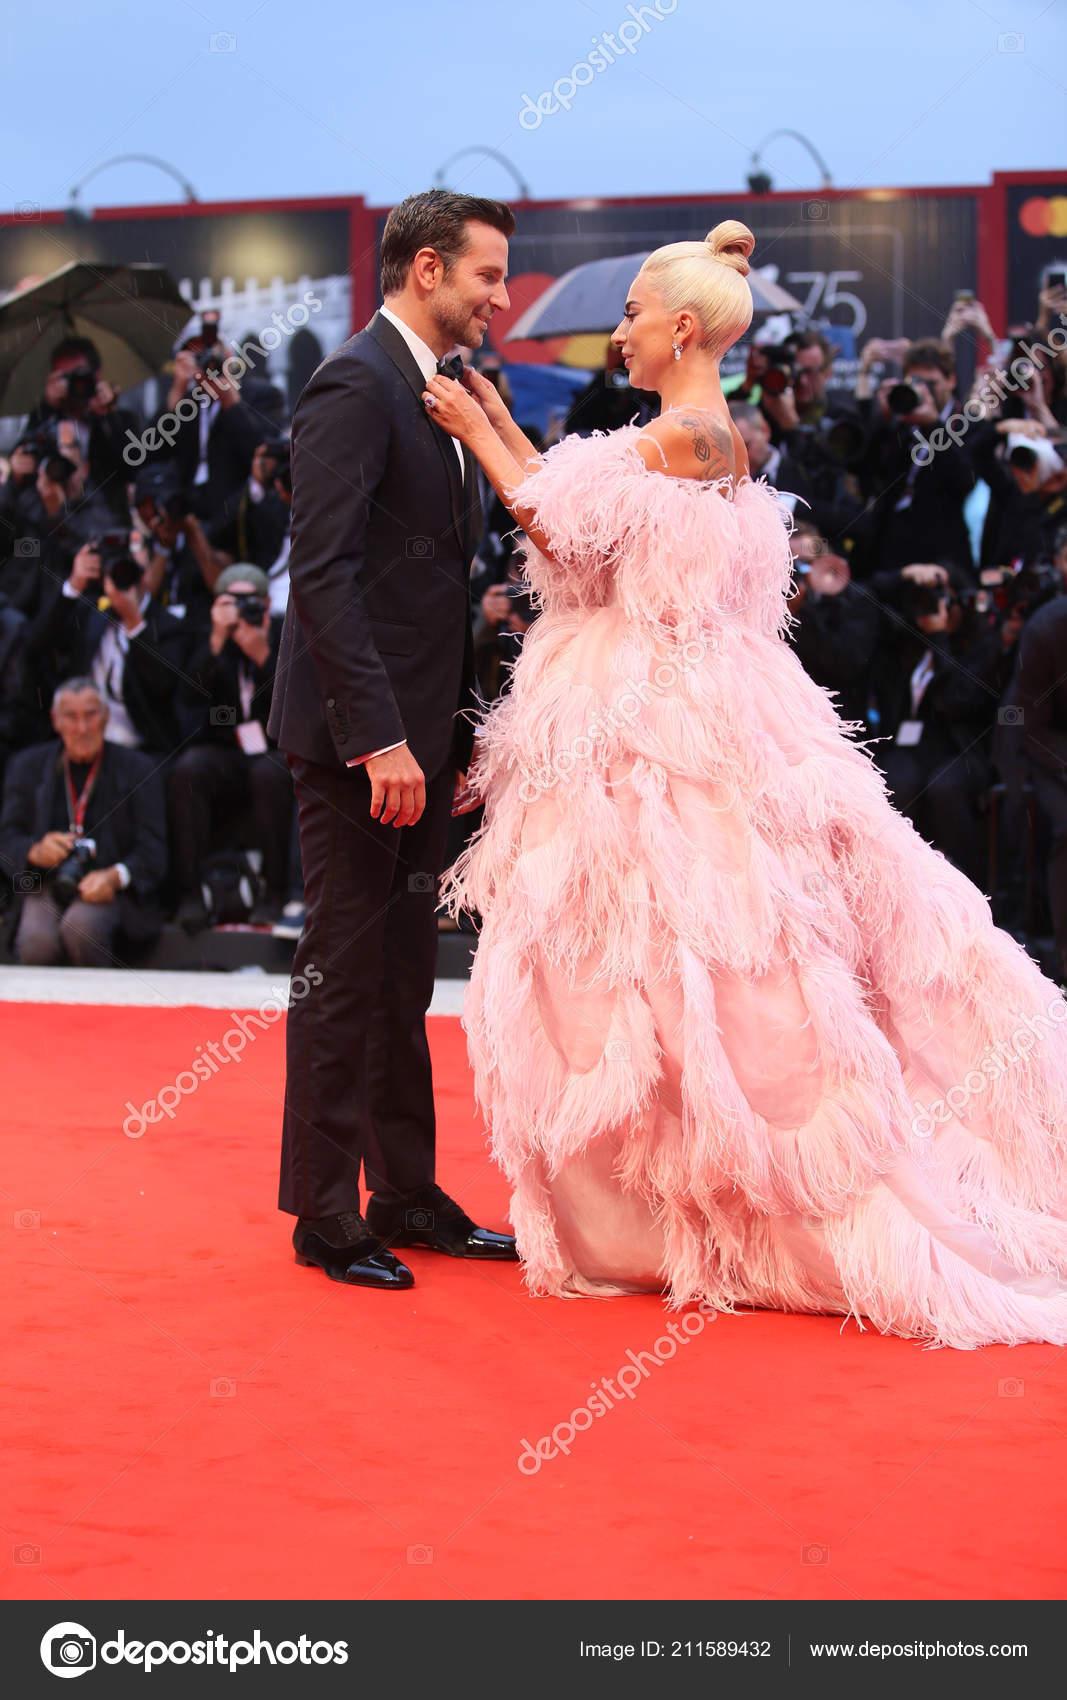 Bradley Cooper Lady Gaga Marche Tapis Rouge Devant Star Born Photo